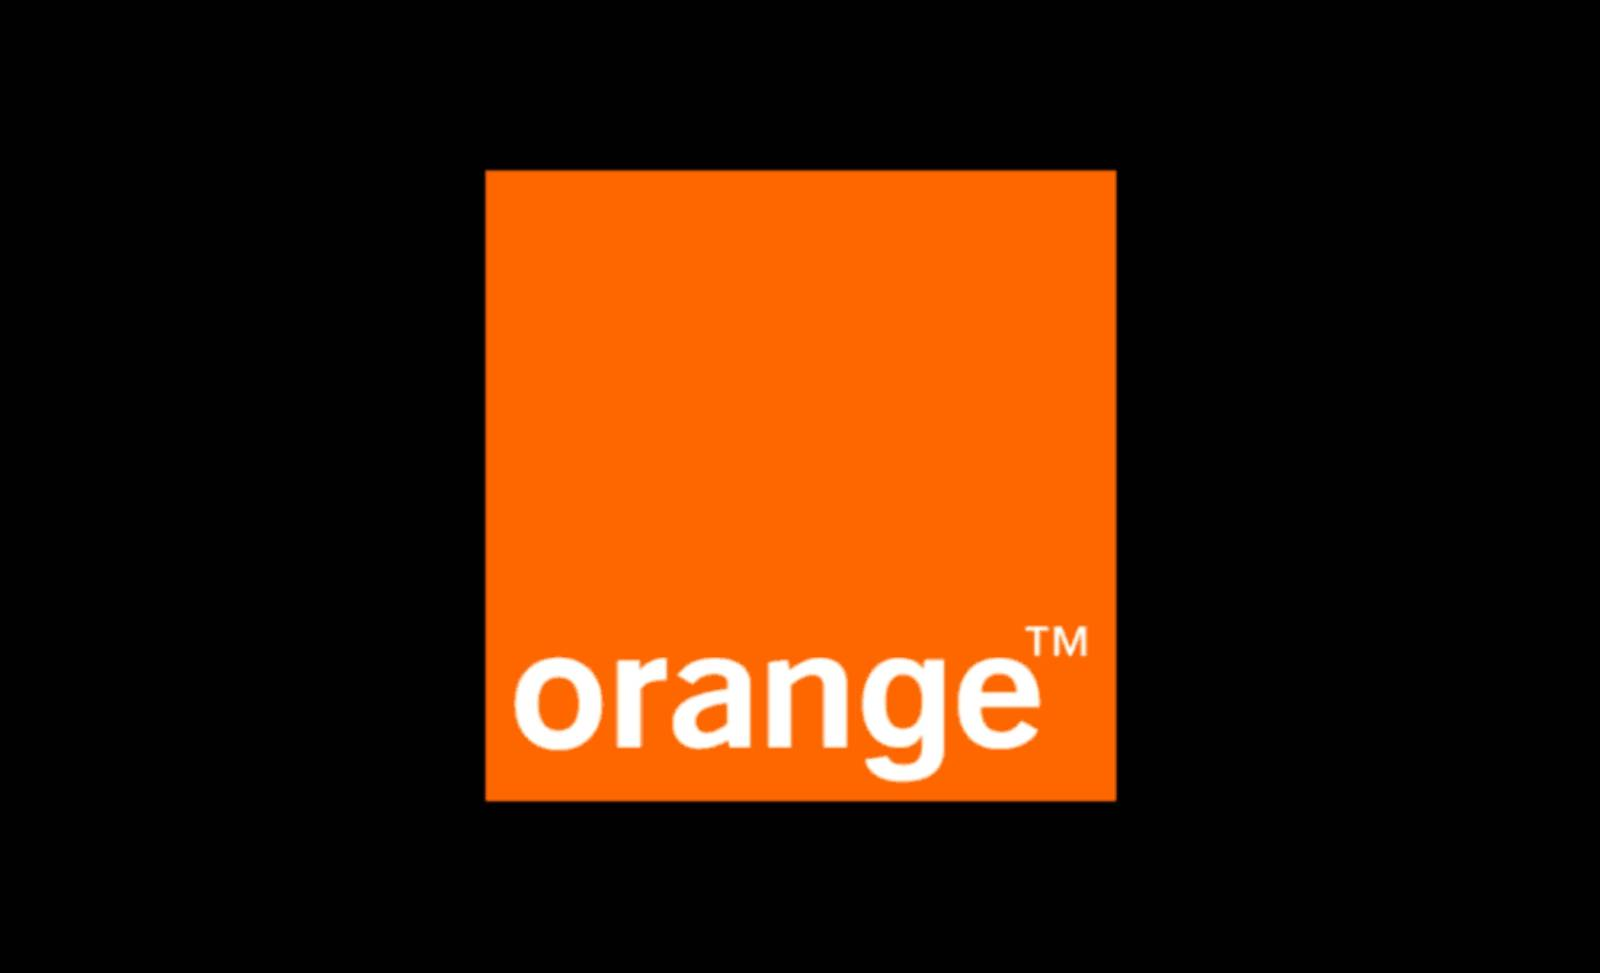 Orange premiere